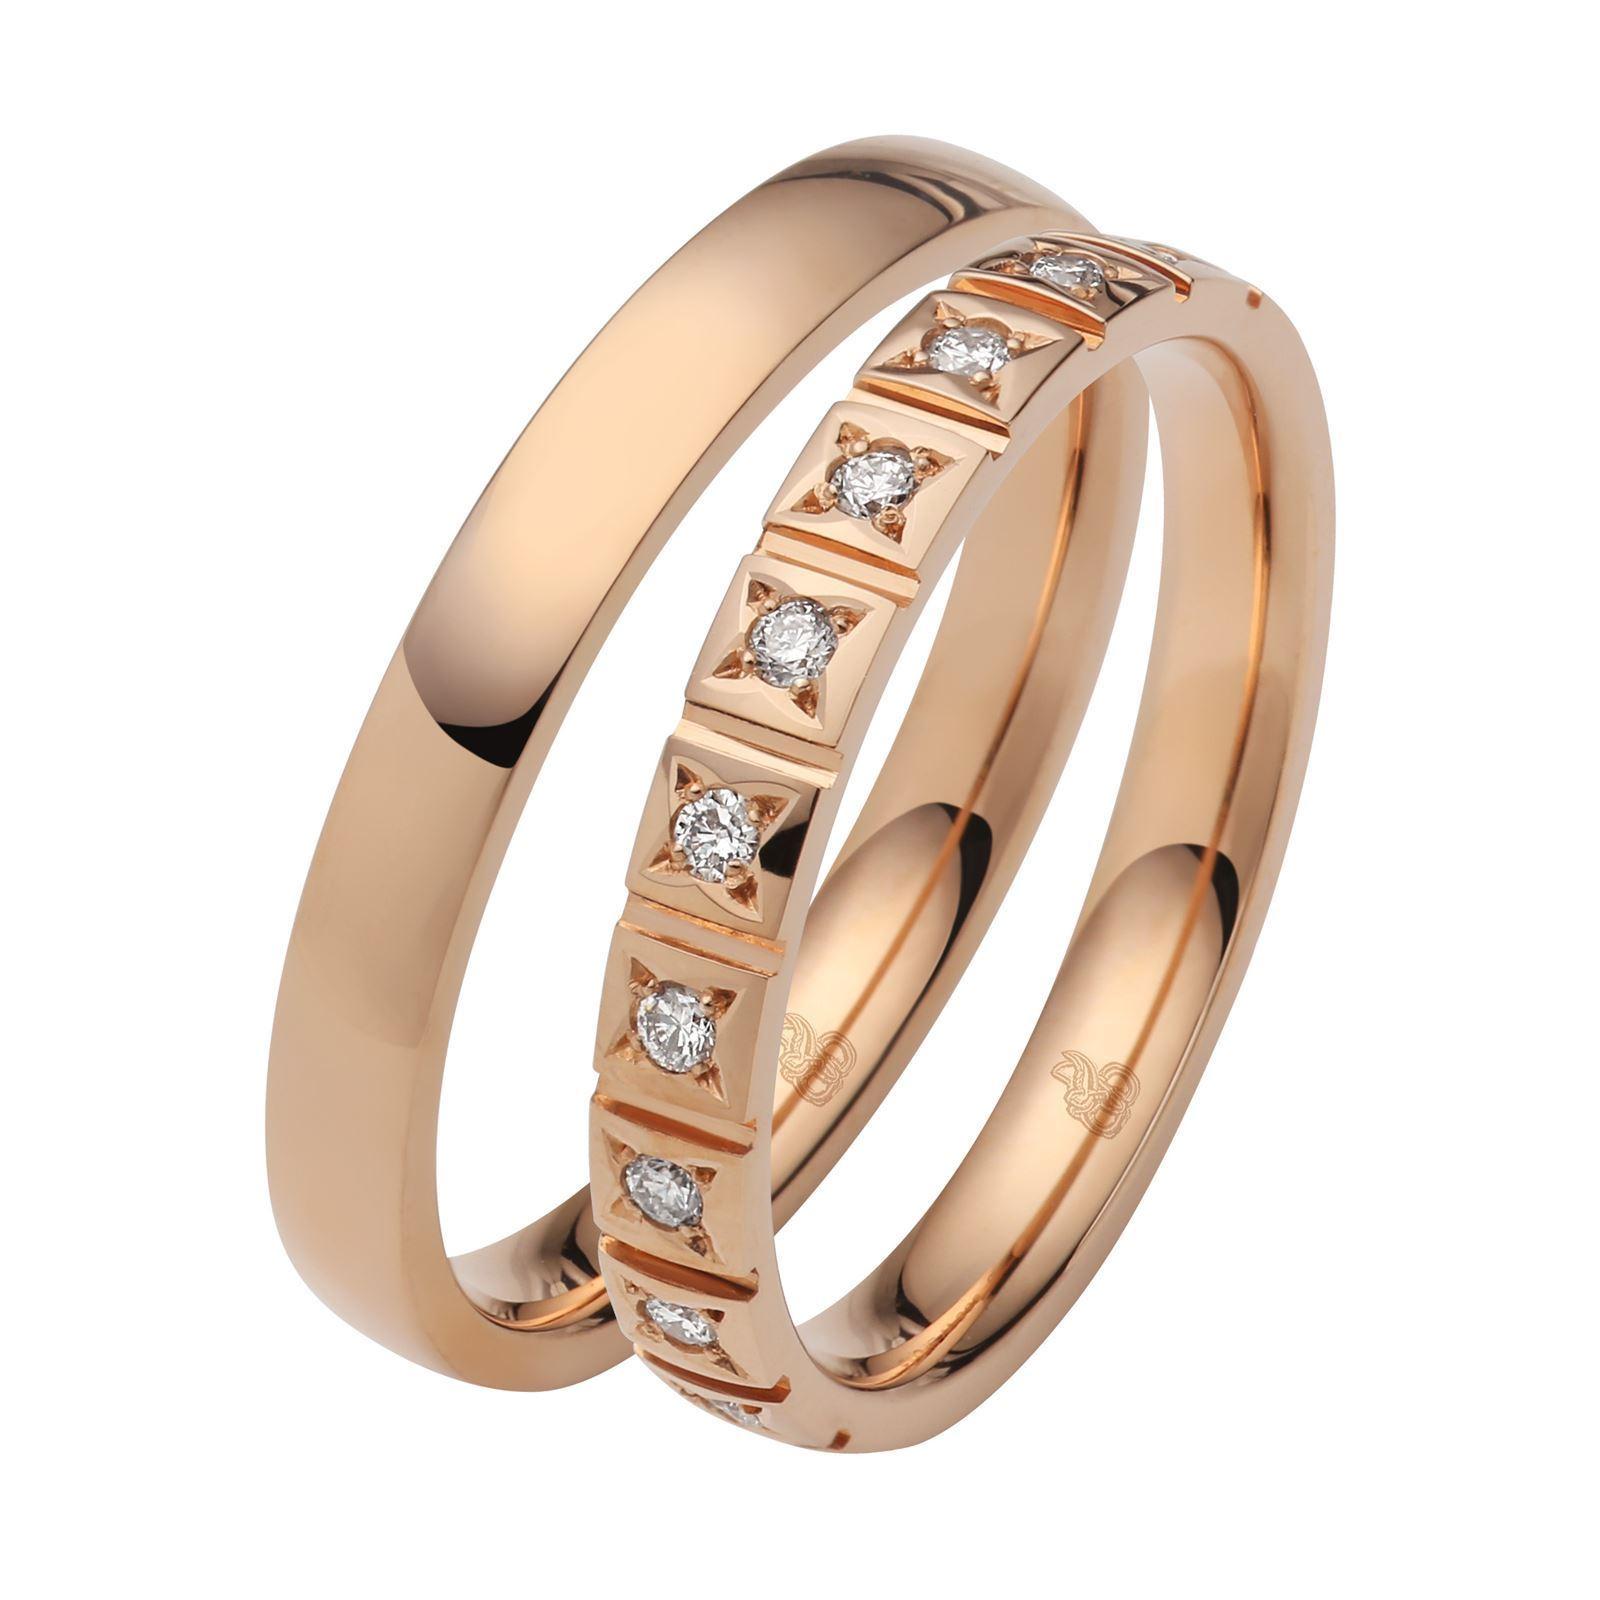 Bilde av Giftering & diamantring 0,15 ct W-Si i gult gull 9k, 3 mm -11035090-1035090